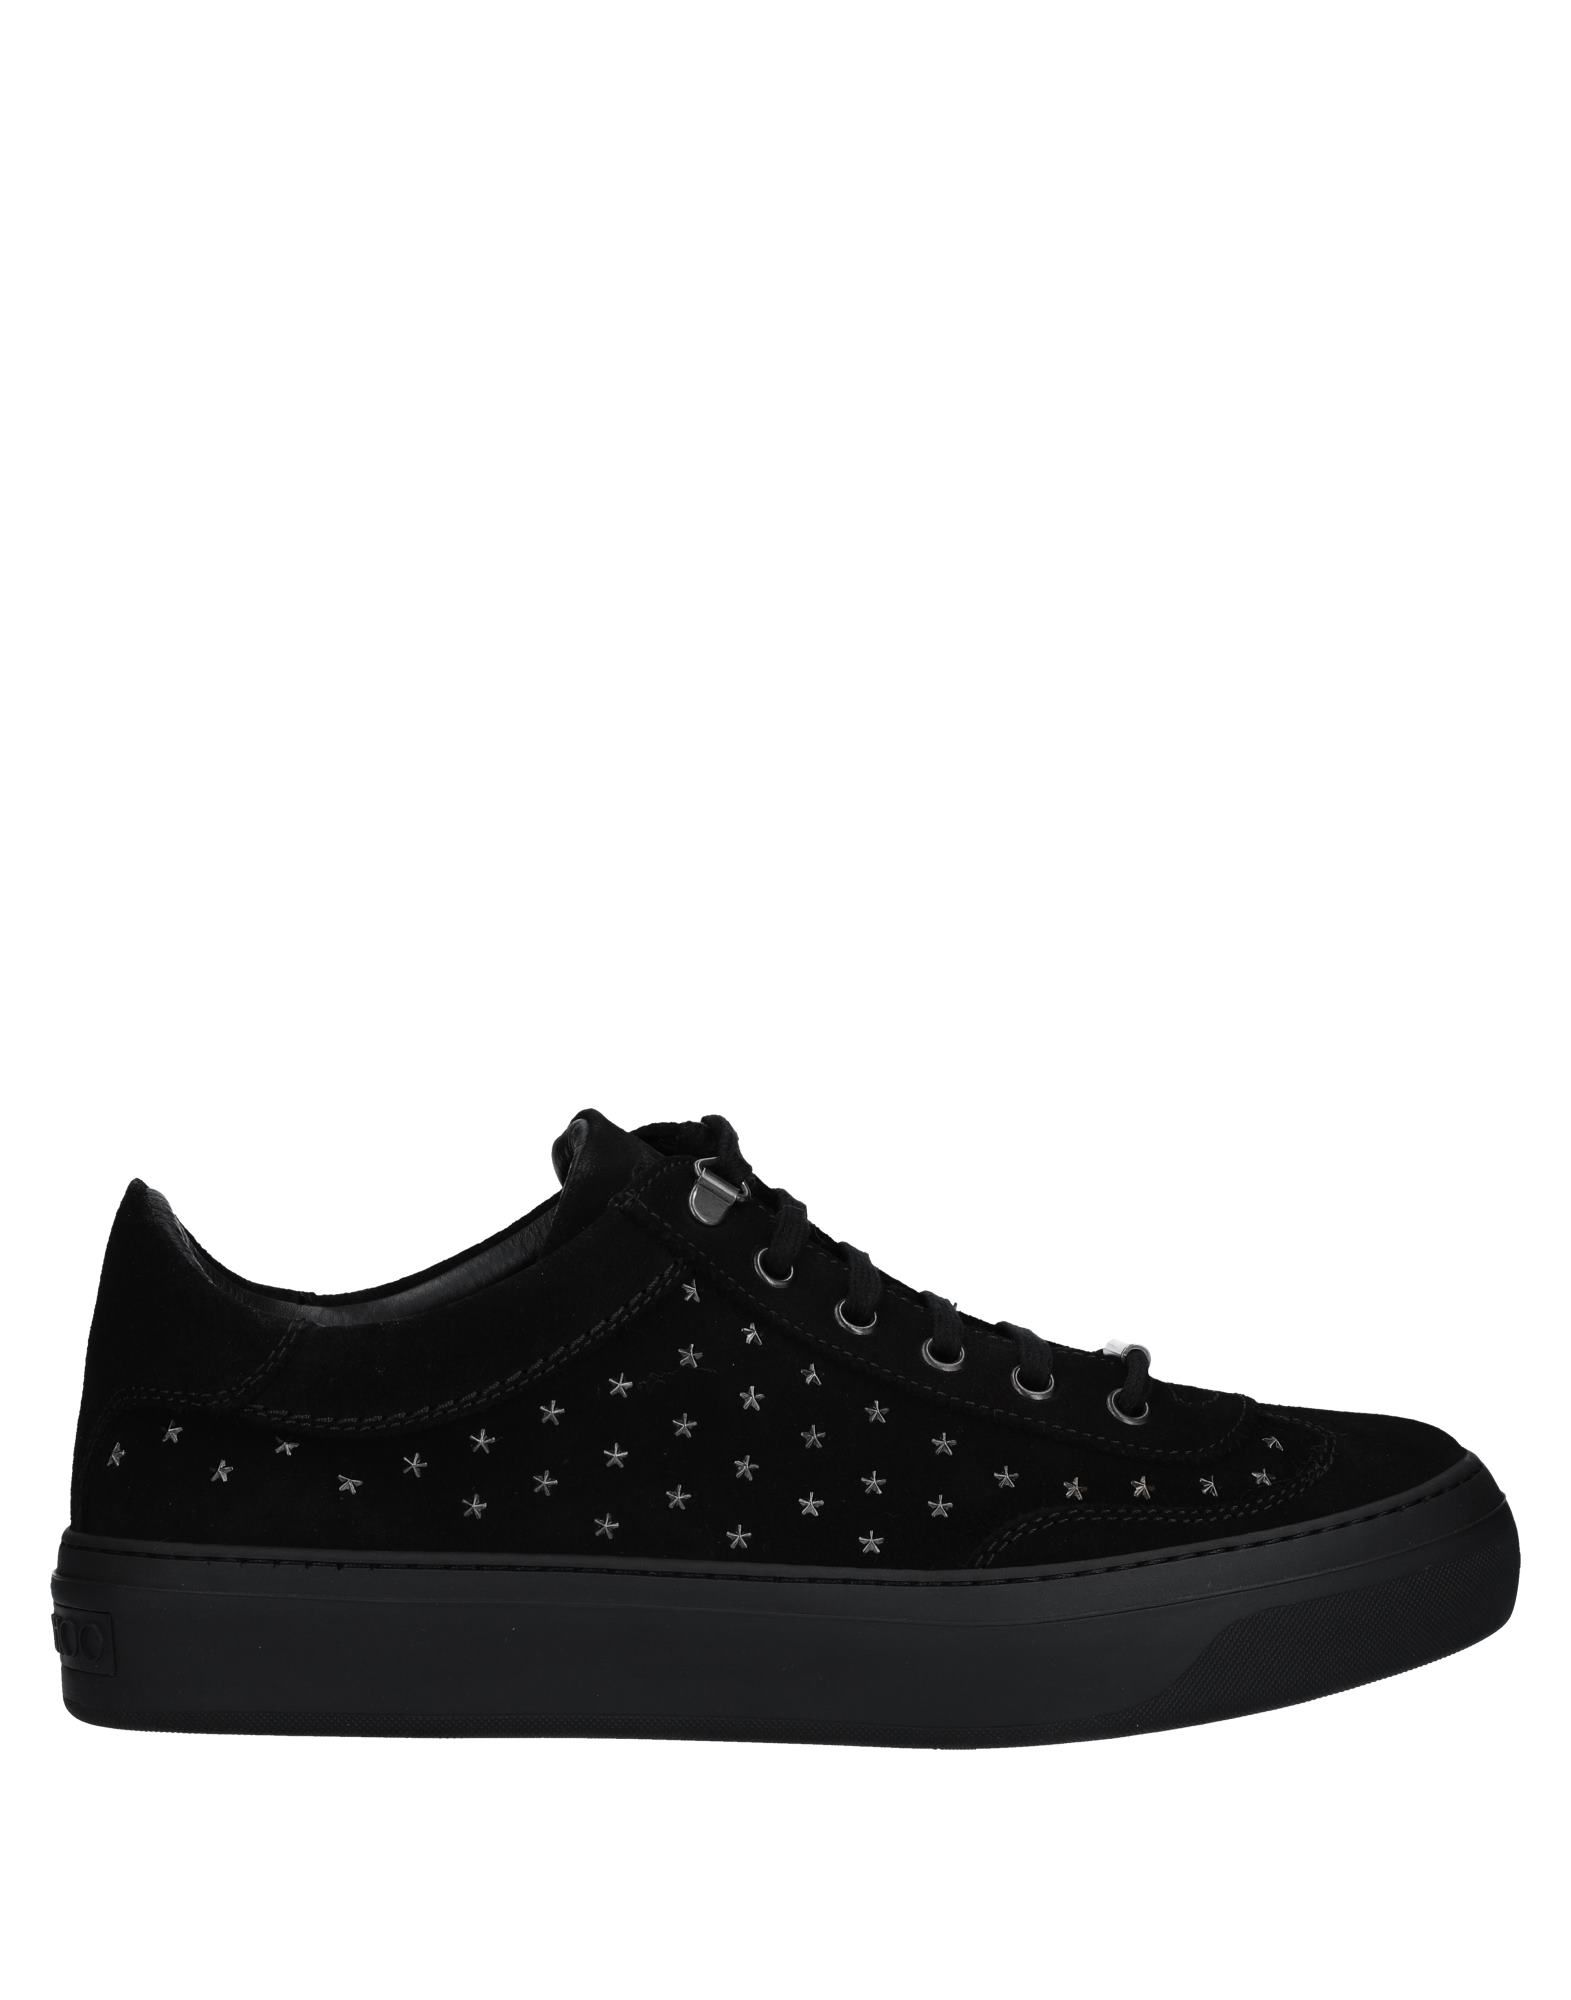 Jimmy Choo Sneakers Herren  11530553CI Gute Qualität beliebte Schuhe